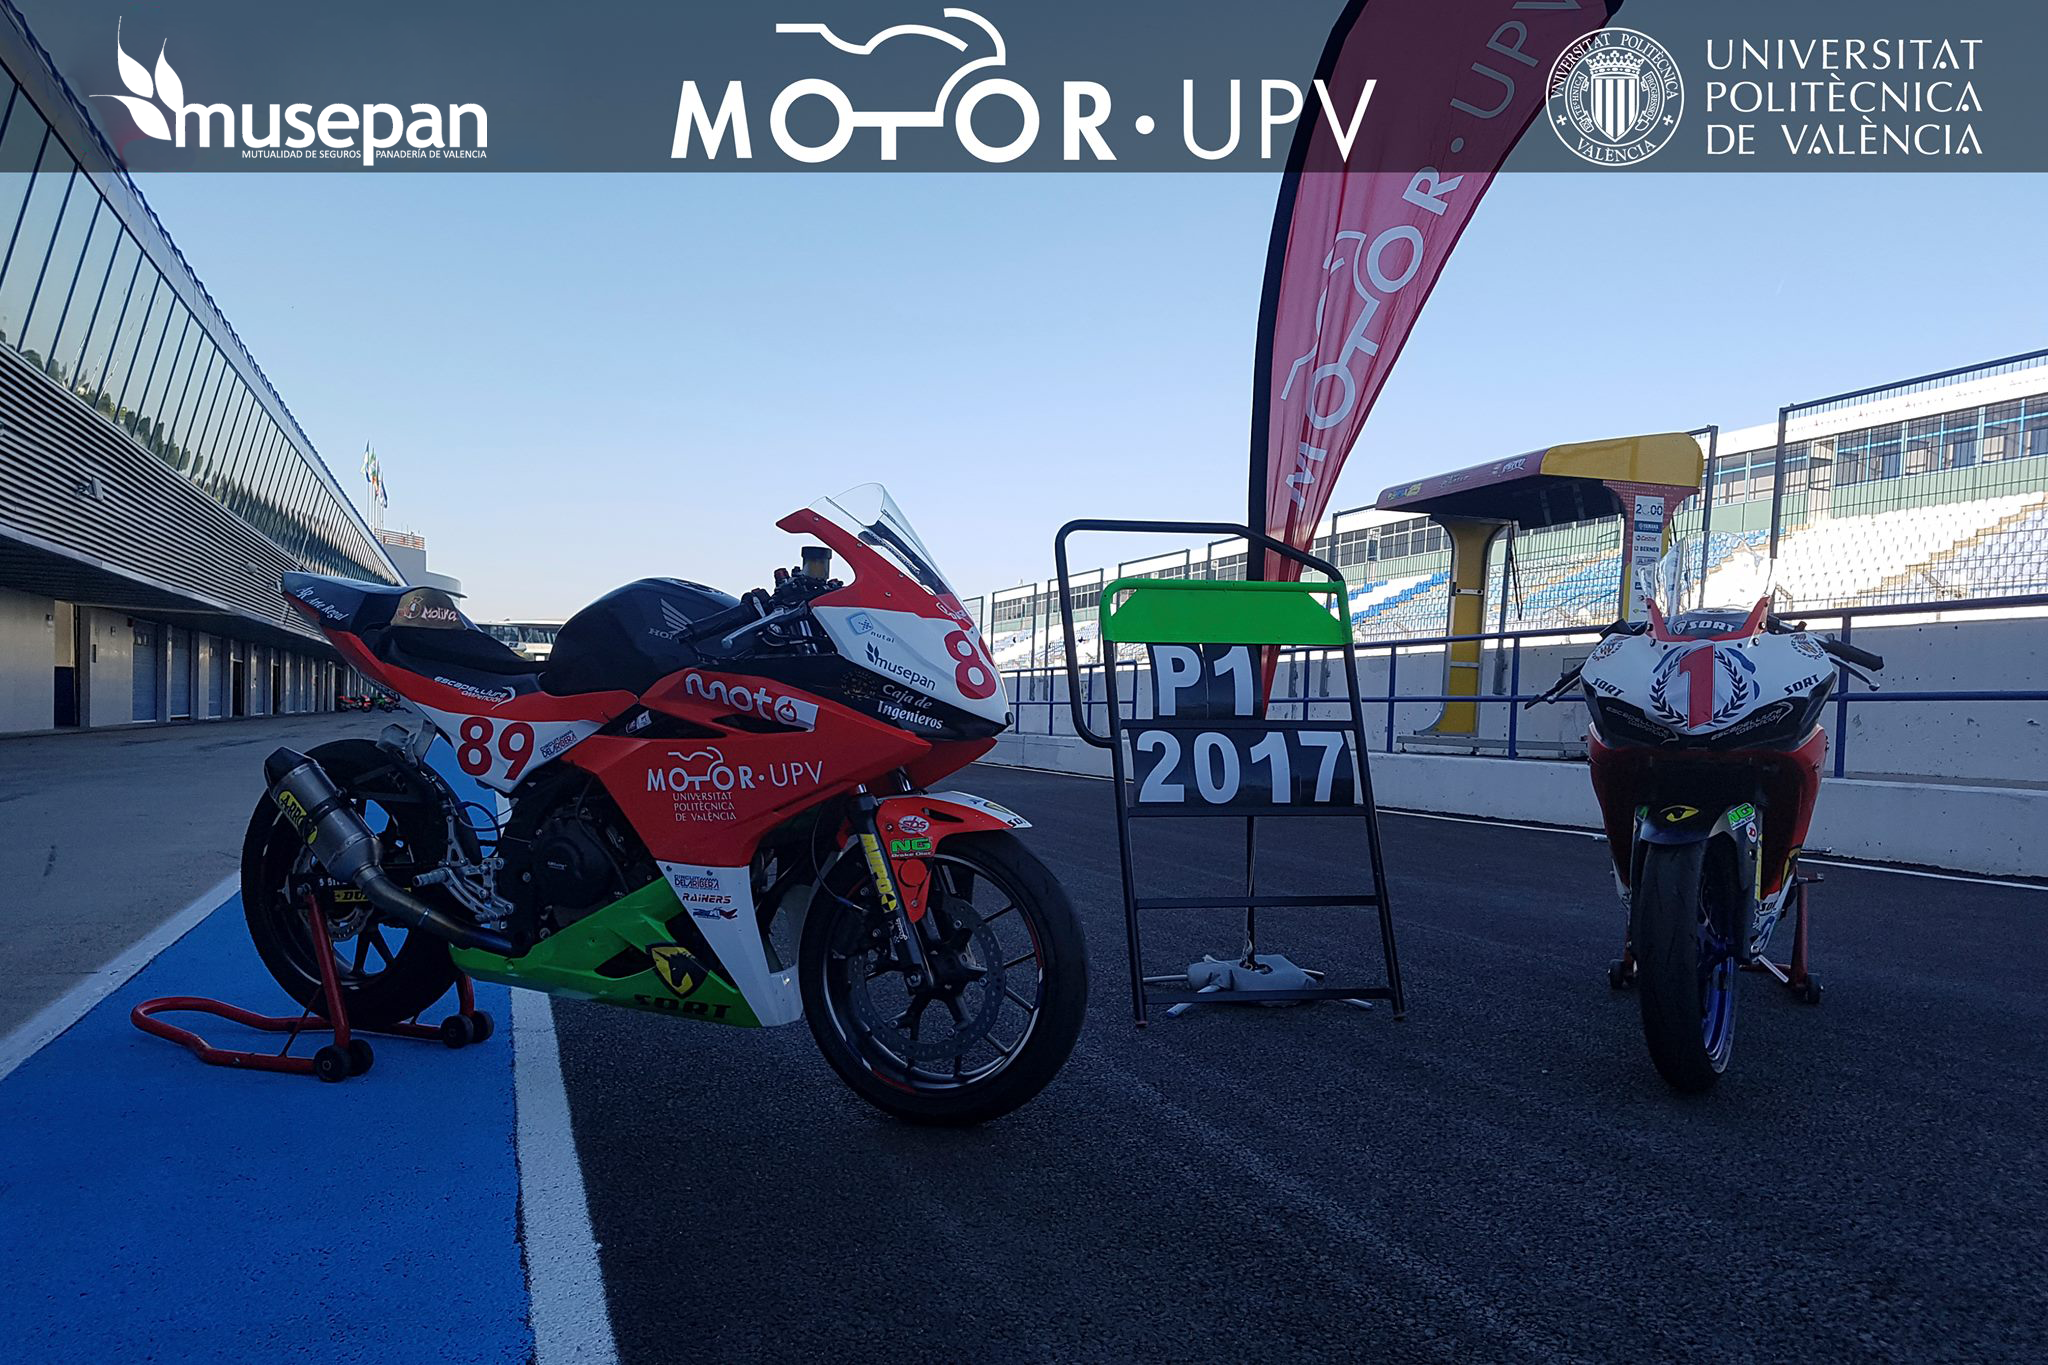 Motor UPV - Musepan. Campeones España Velocidad 2017